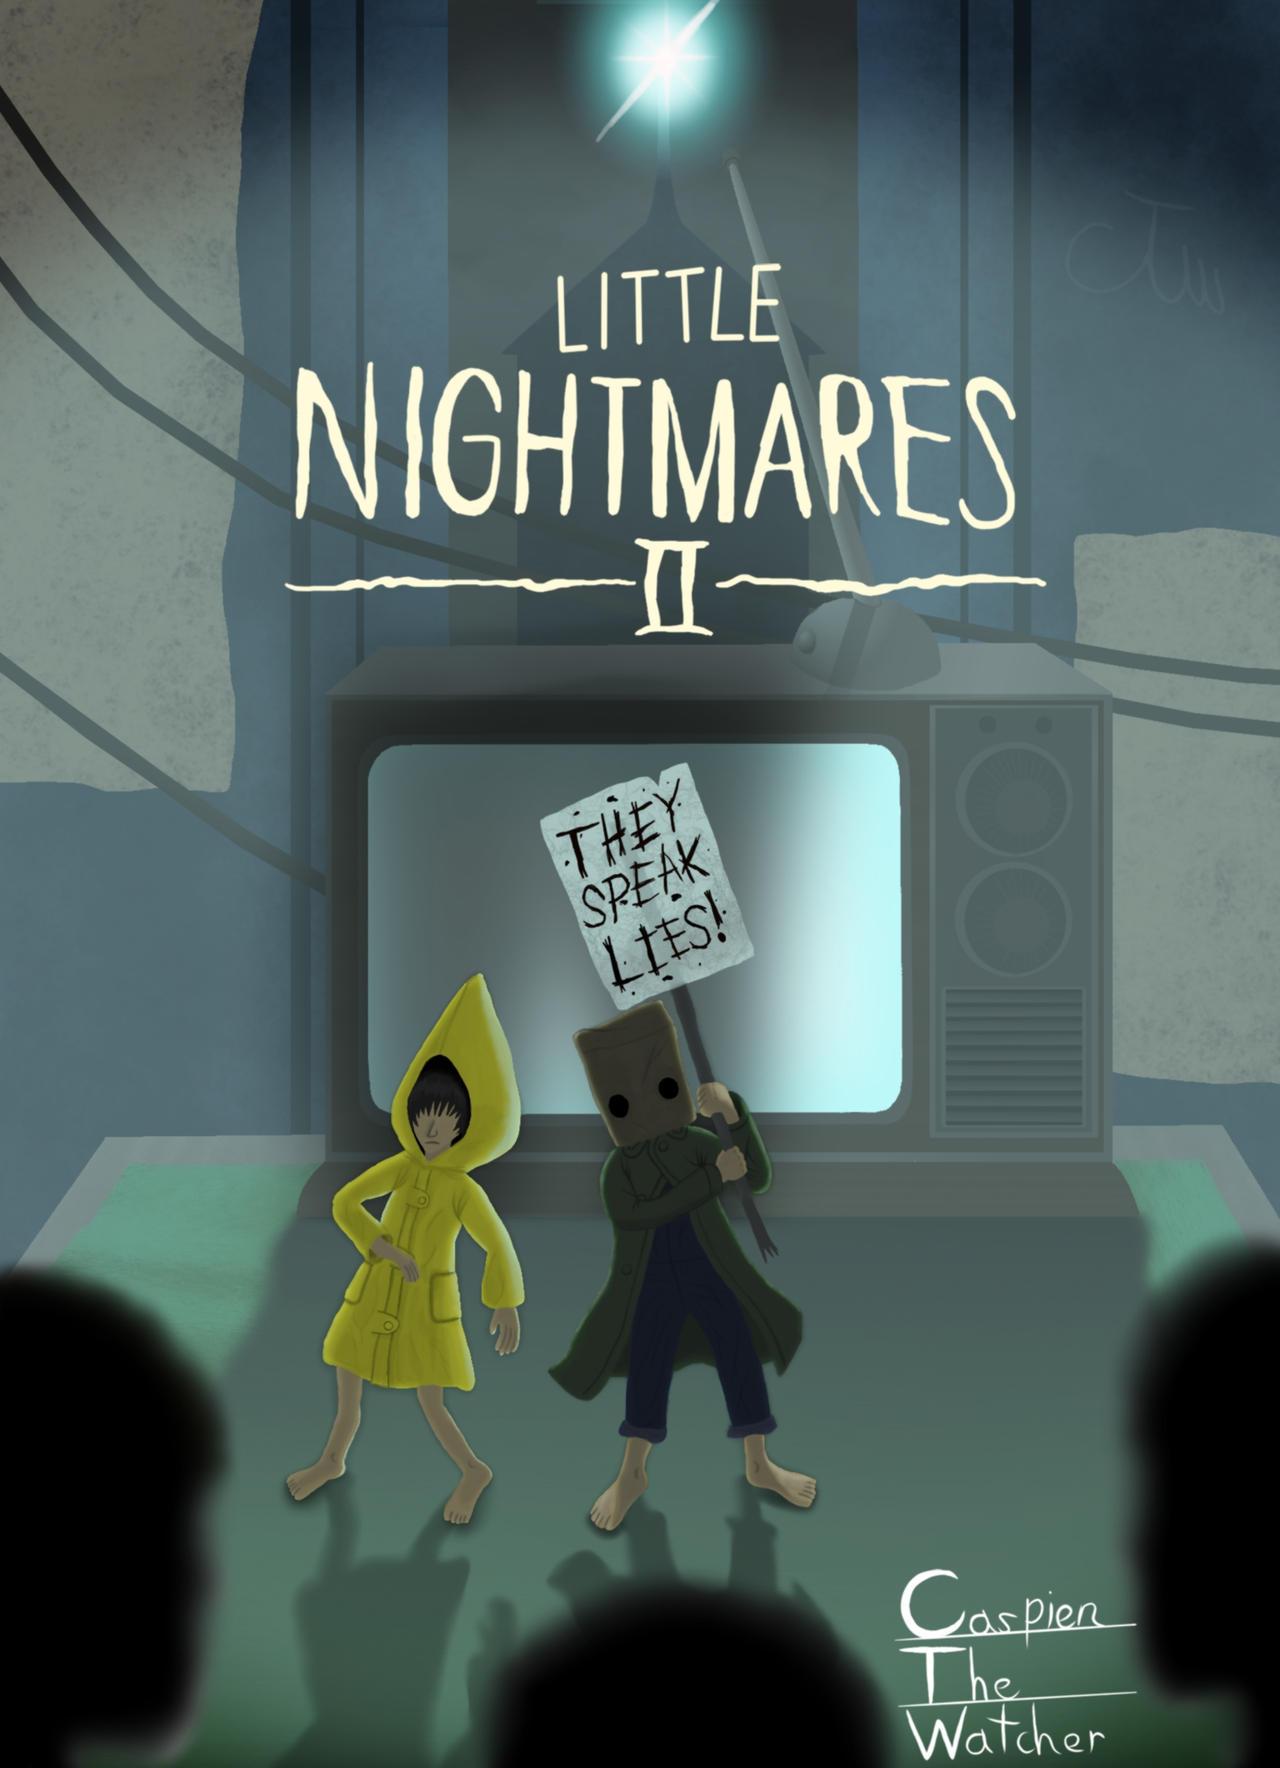 Little Nightmares 2 THEY SPEAK LIES (Fanart)